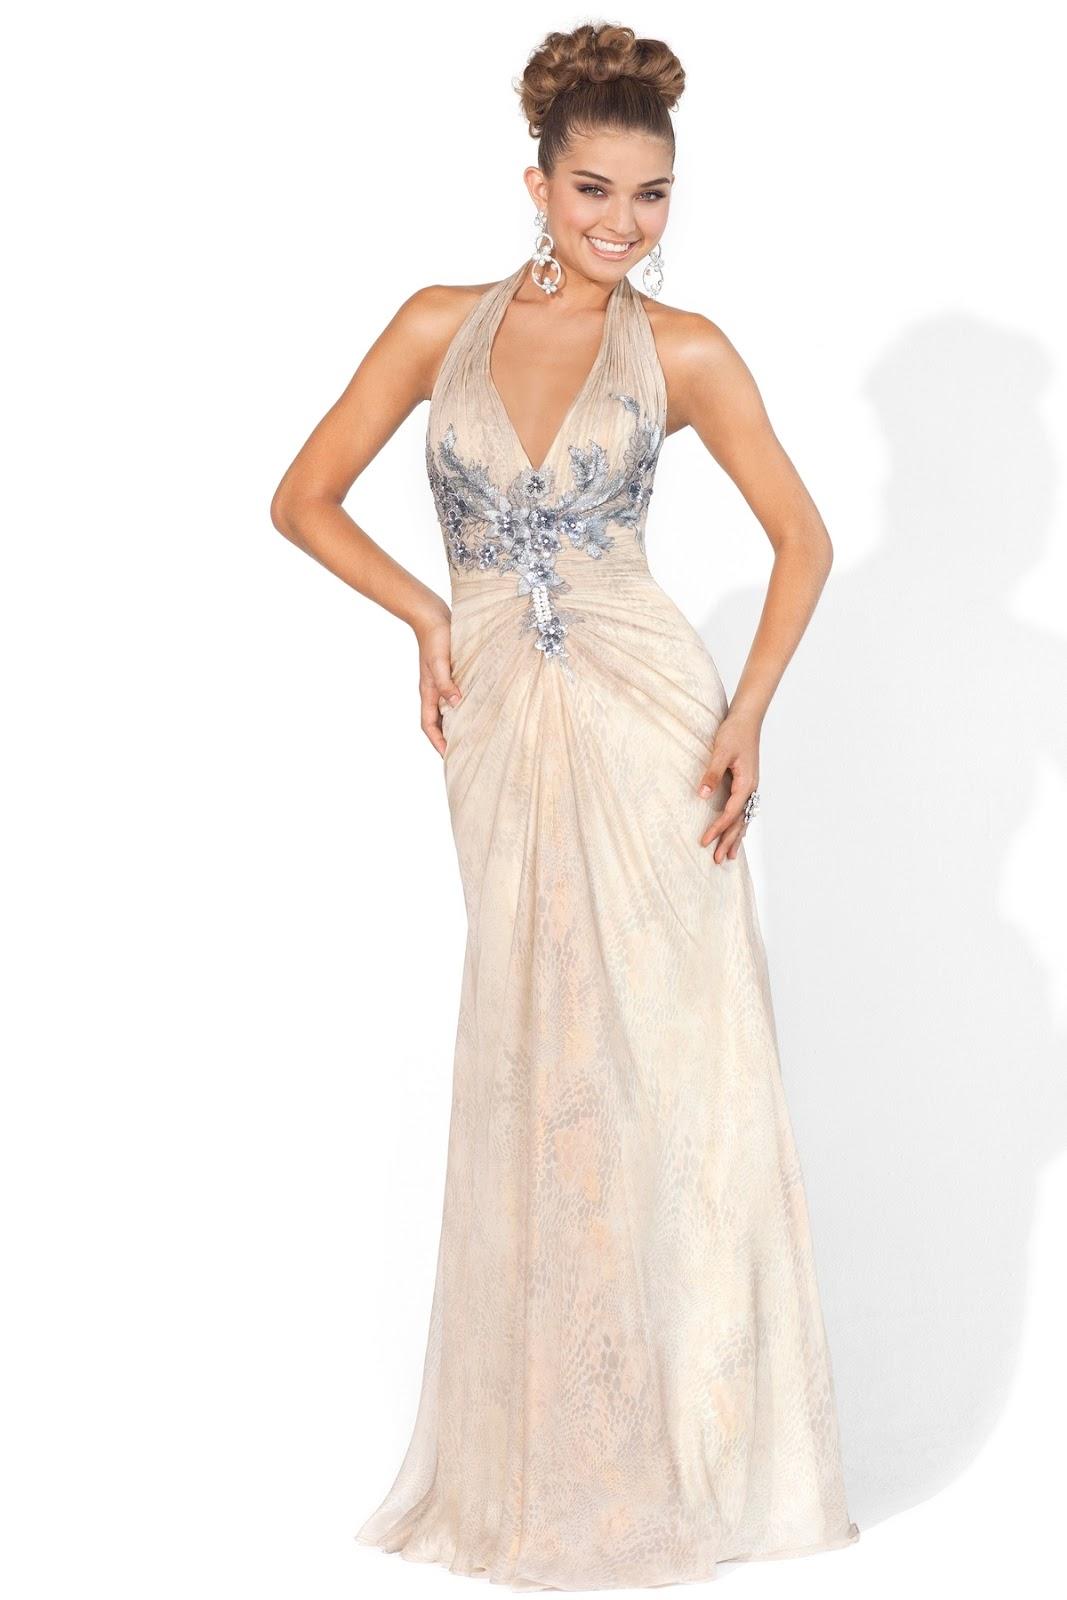 Short prom dresses blush by alexia 2012 bridesmaids dresses for 2012 dresses